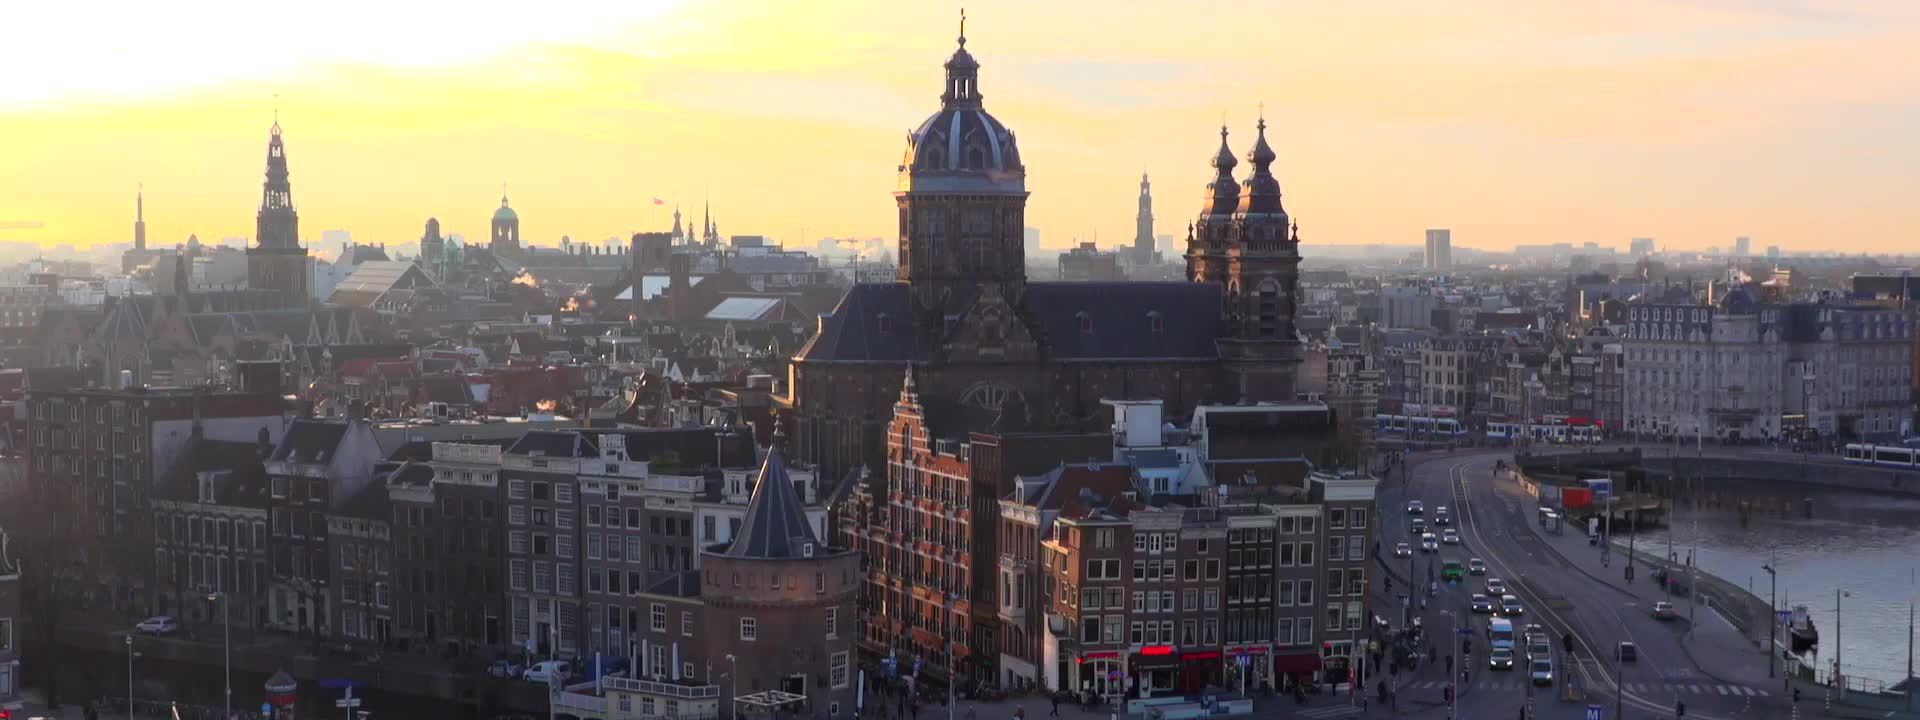 amsterdam,  GIFs